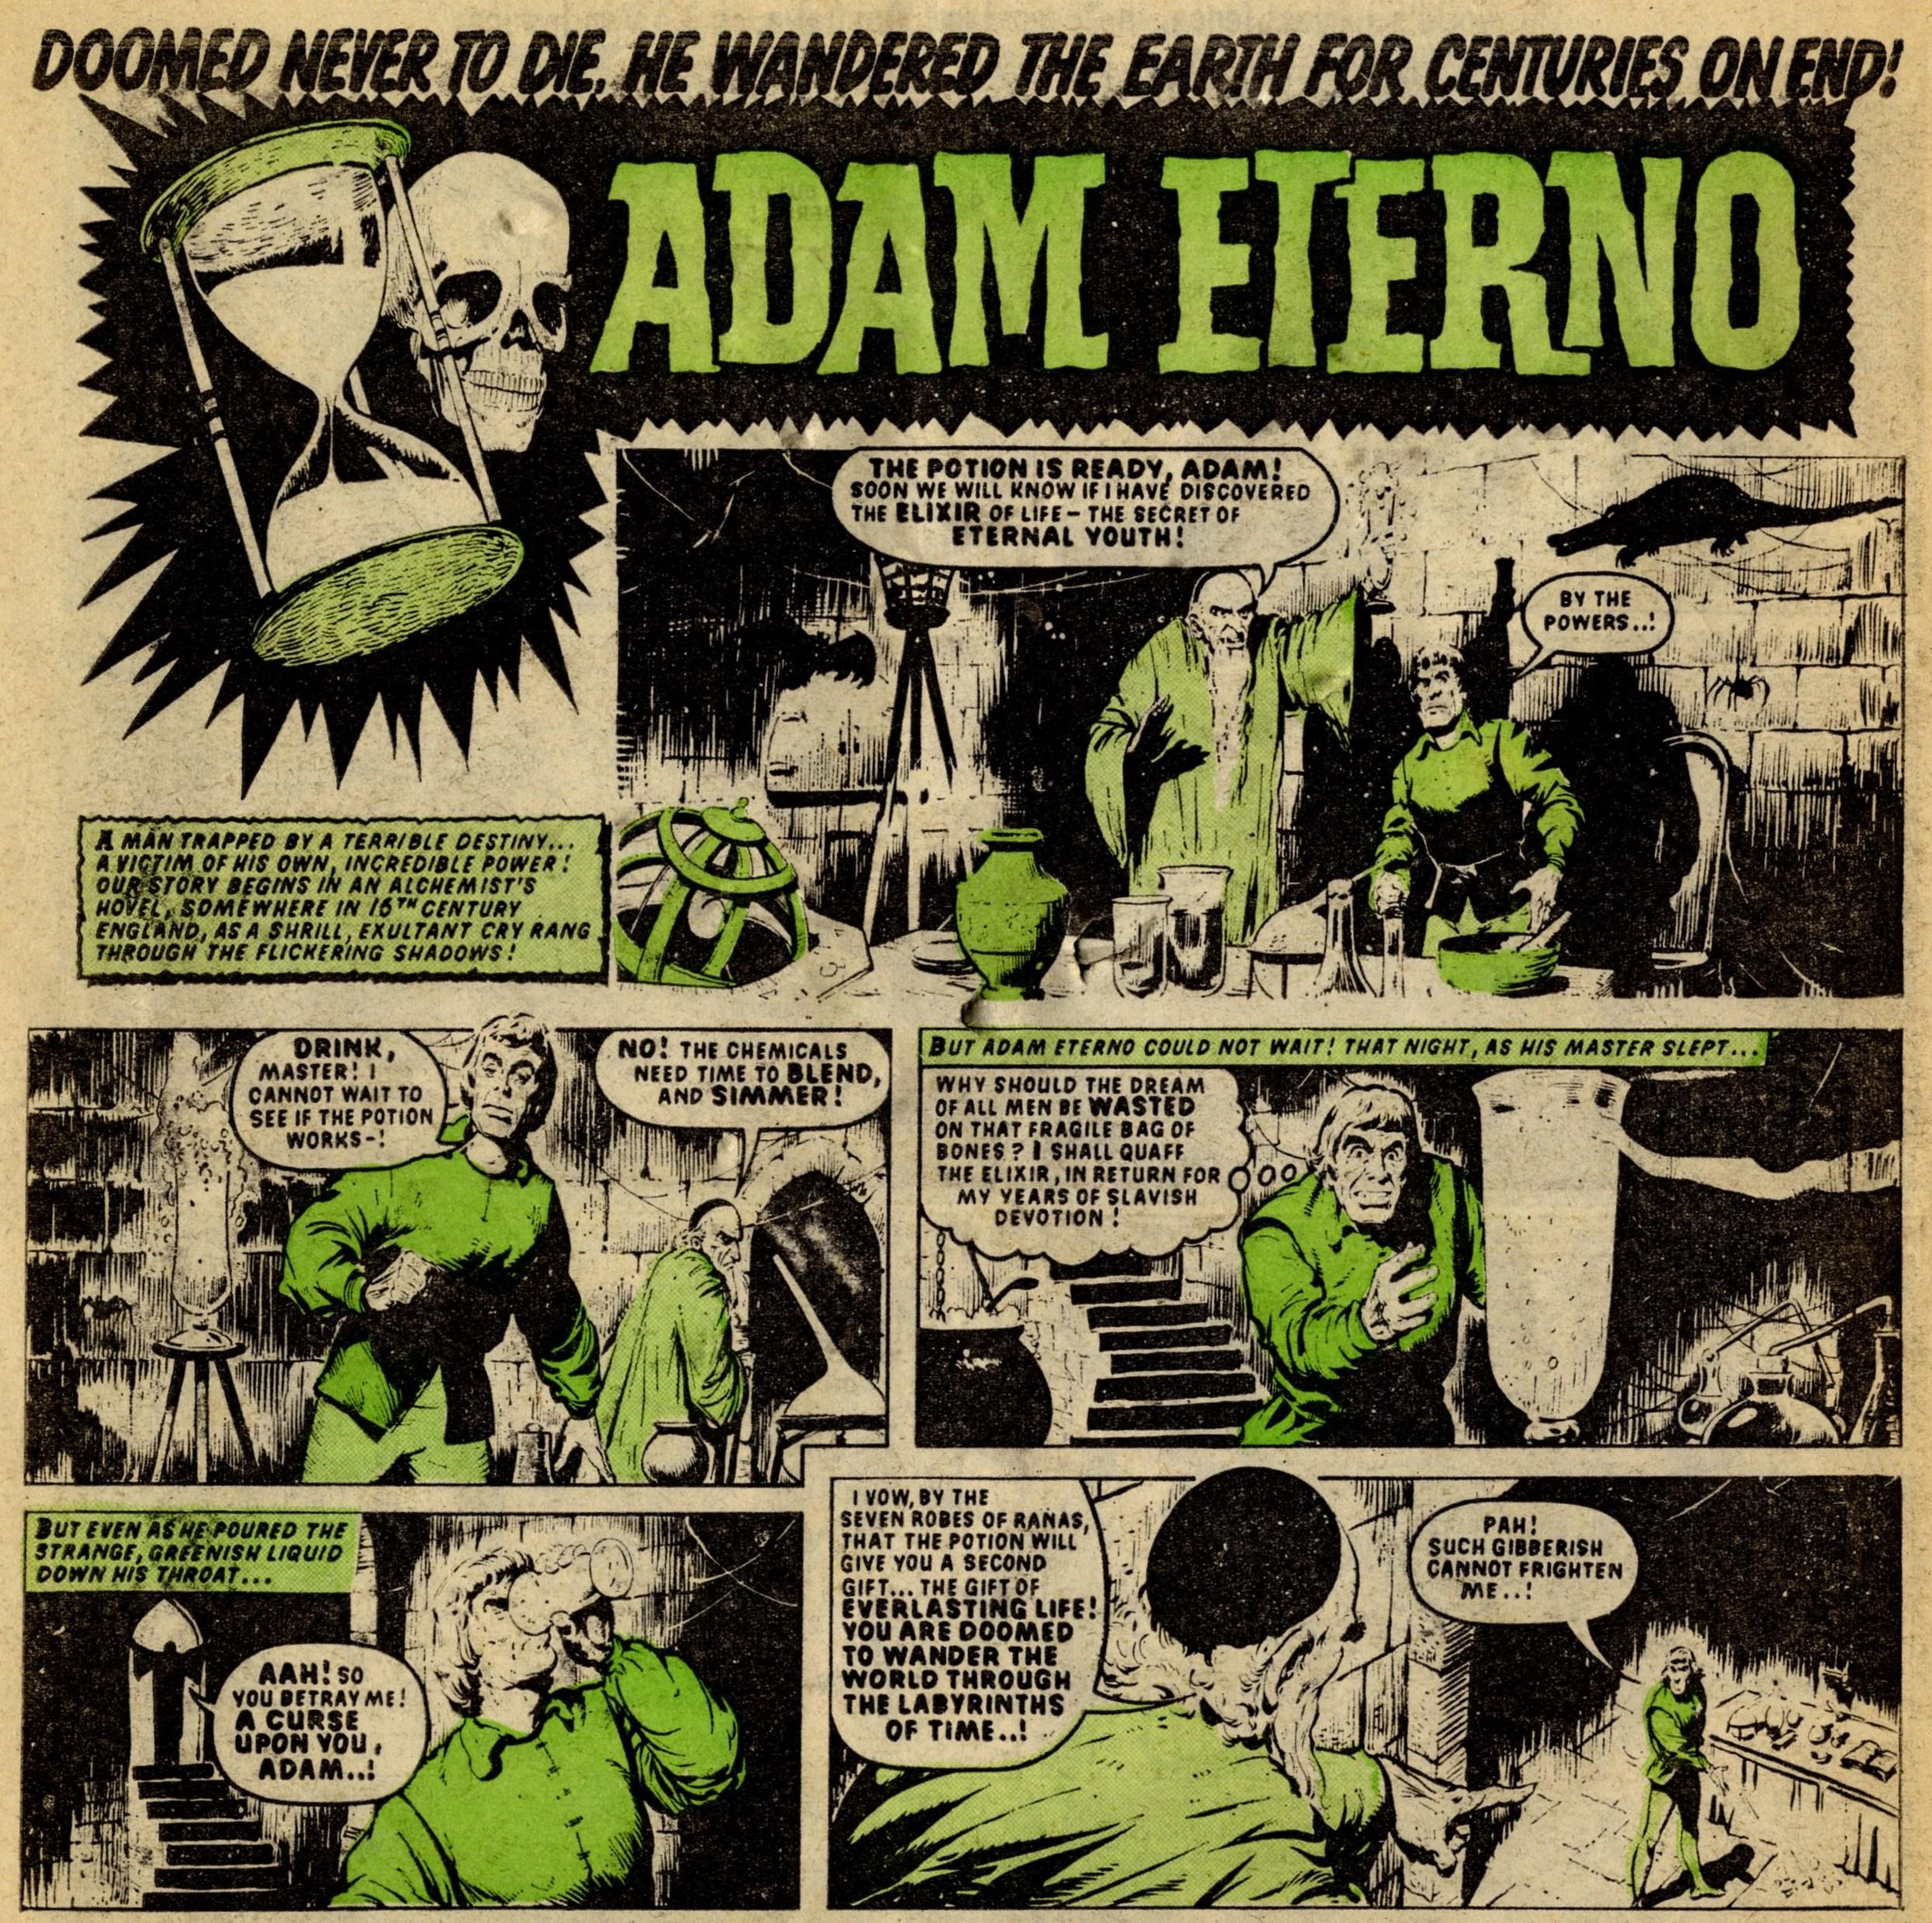 Adam Eterno: Tom Kerr (artist)